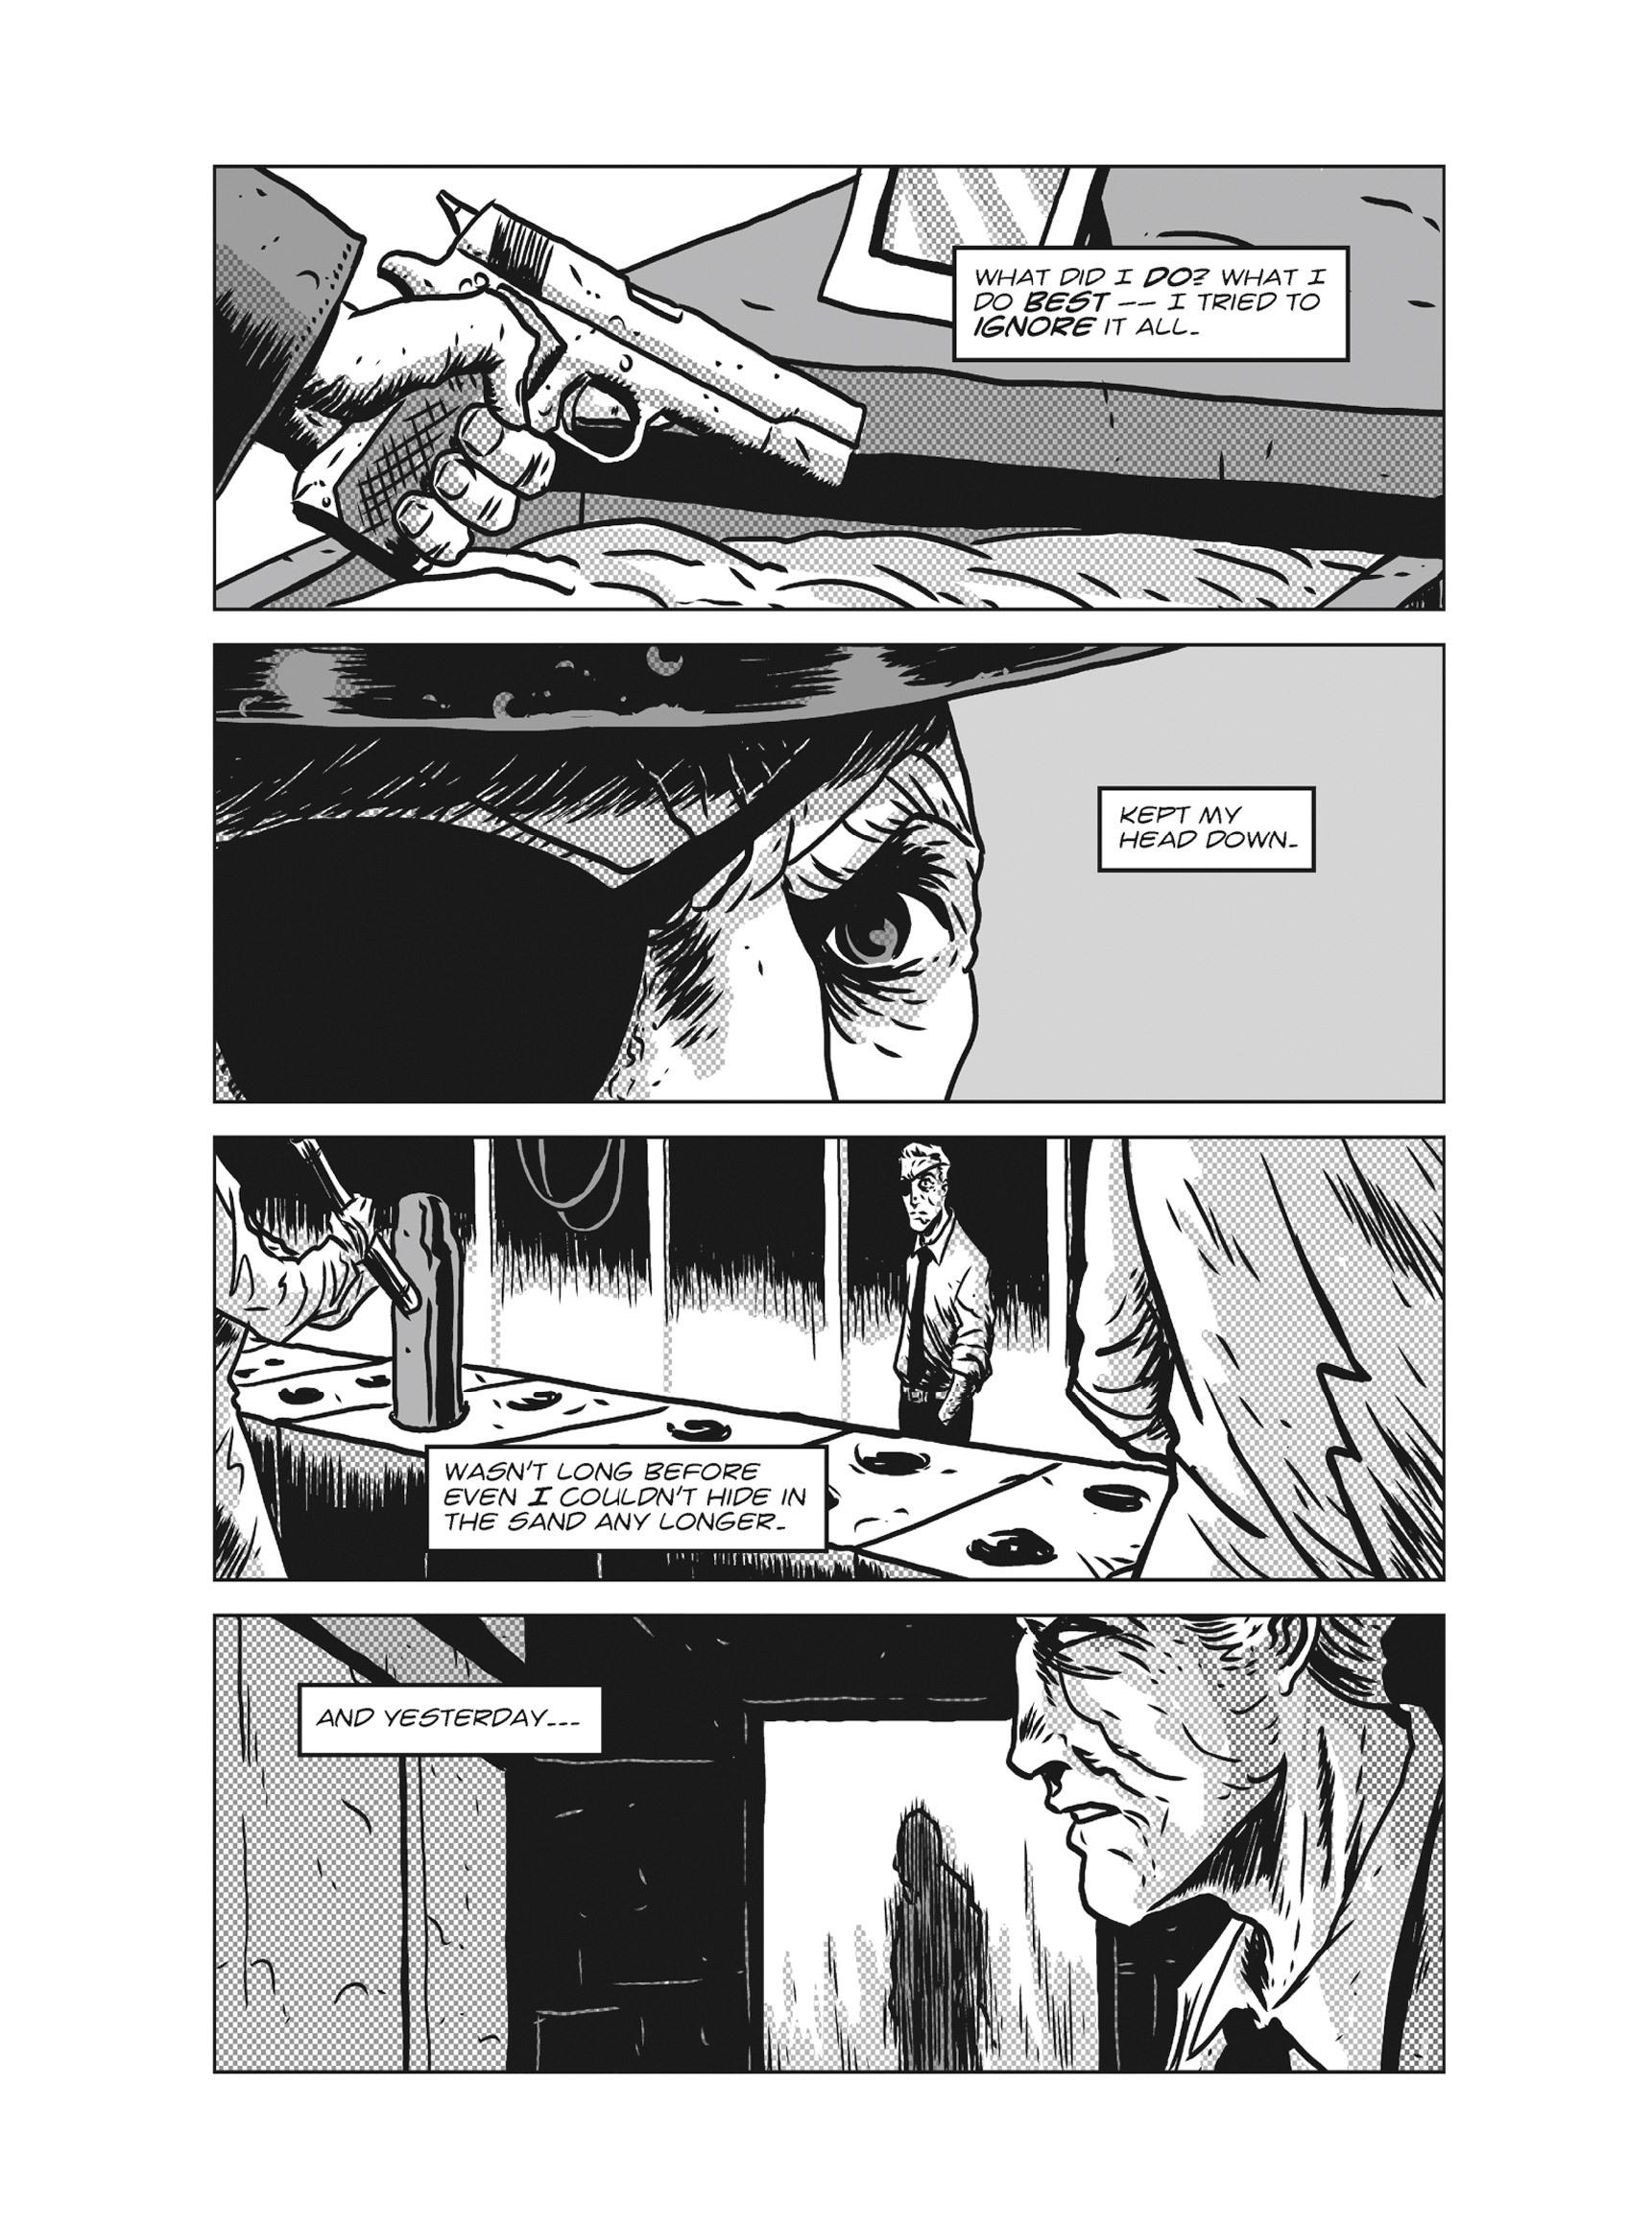 Read online FUBAR comic -  Issue #3 - 264